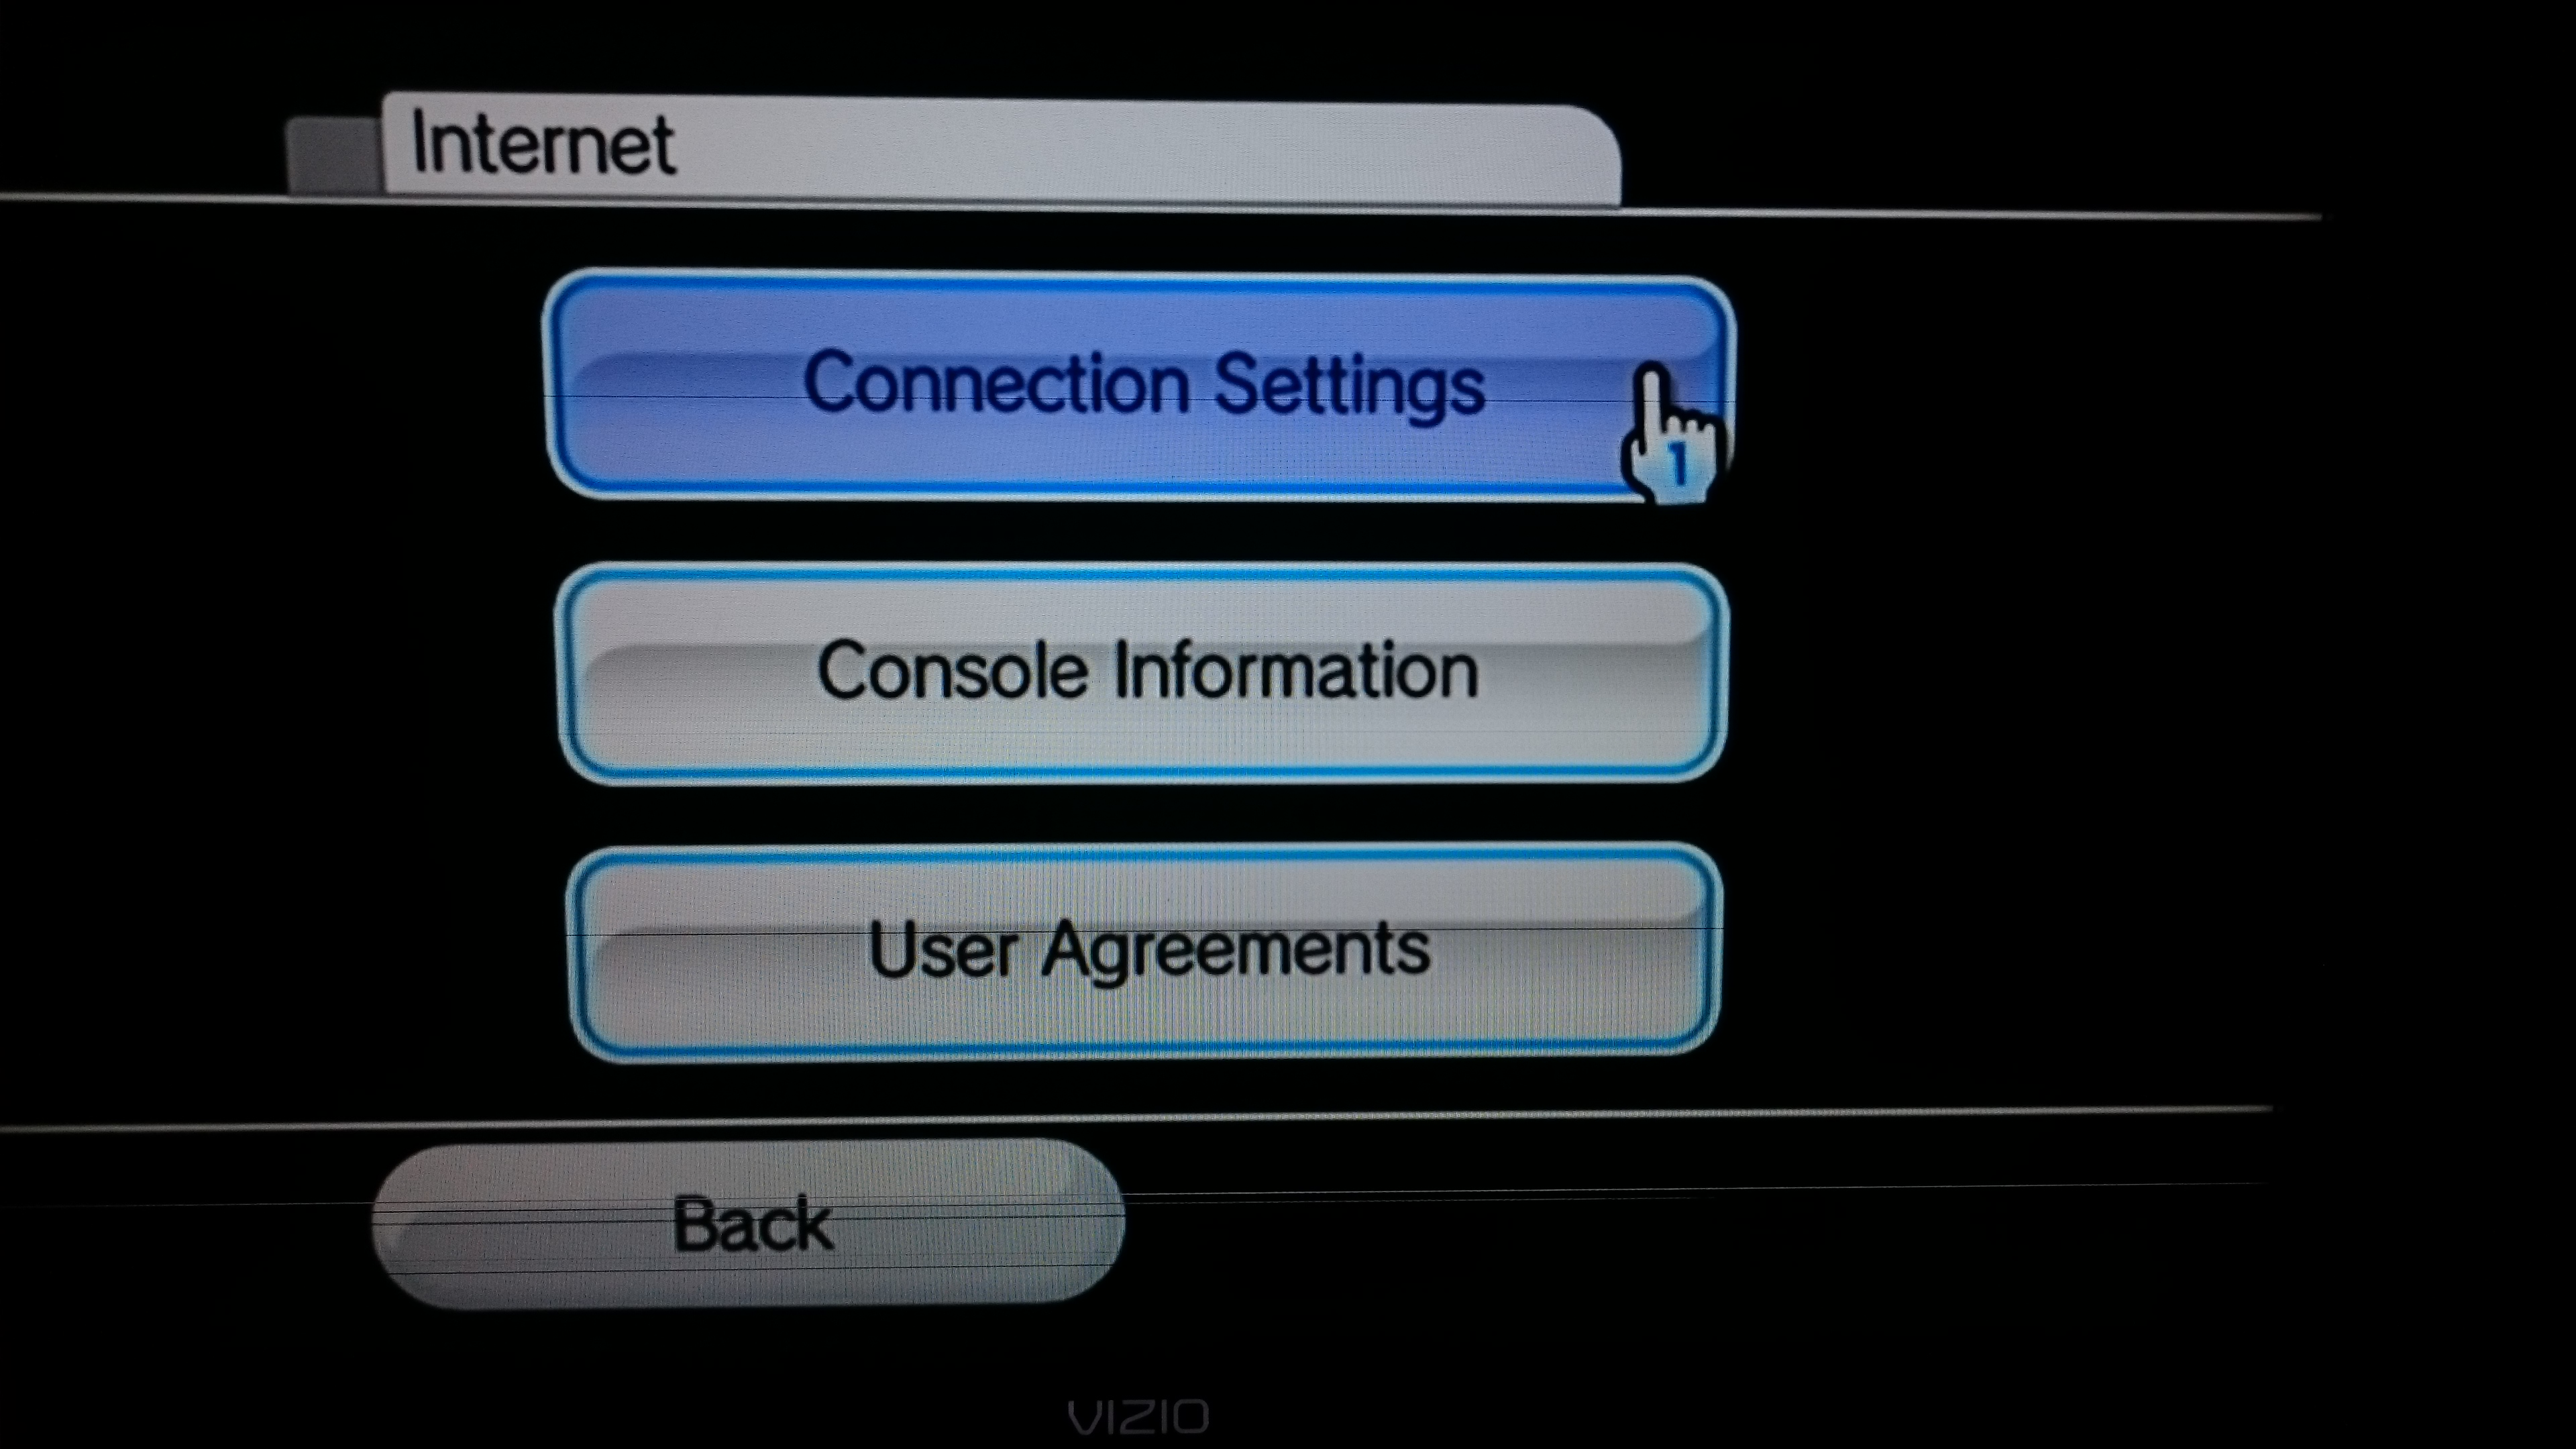 Wii Step 6